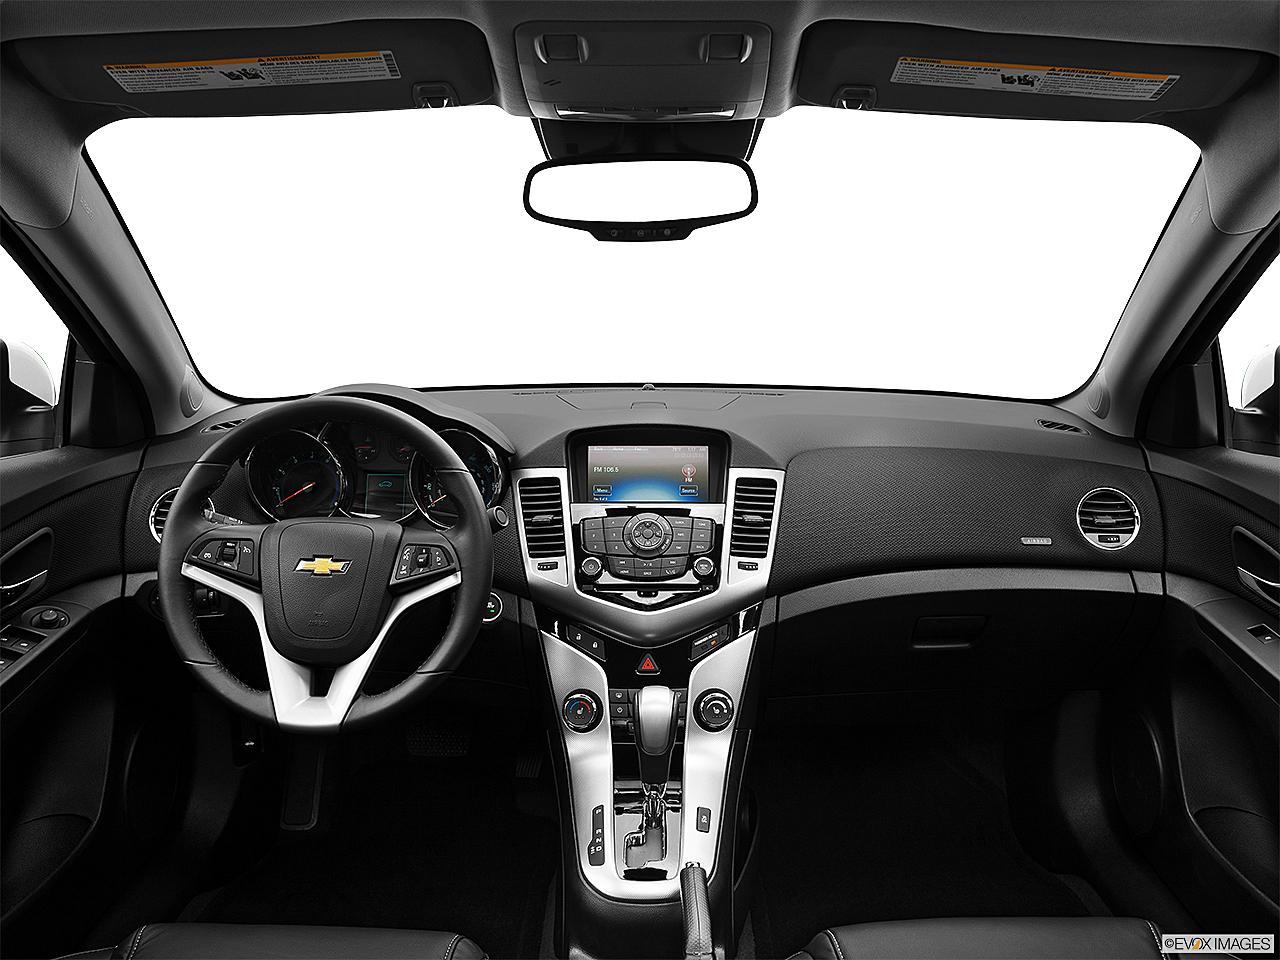 2013 Chevrolet Cruze LTZ Auto 4dr Sedan w/1SJ - Research - GrooveCar